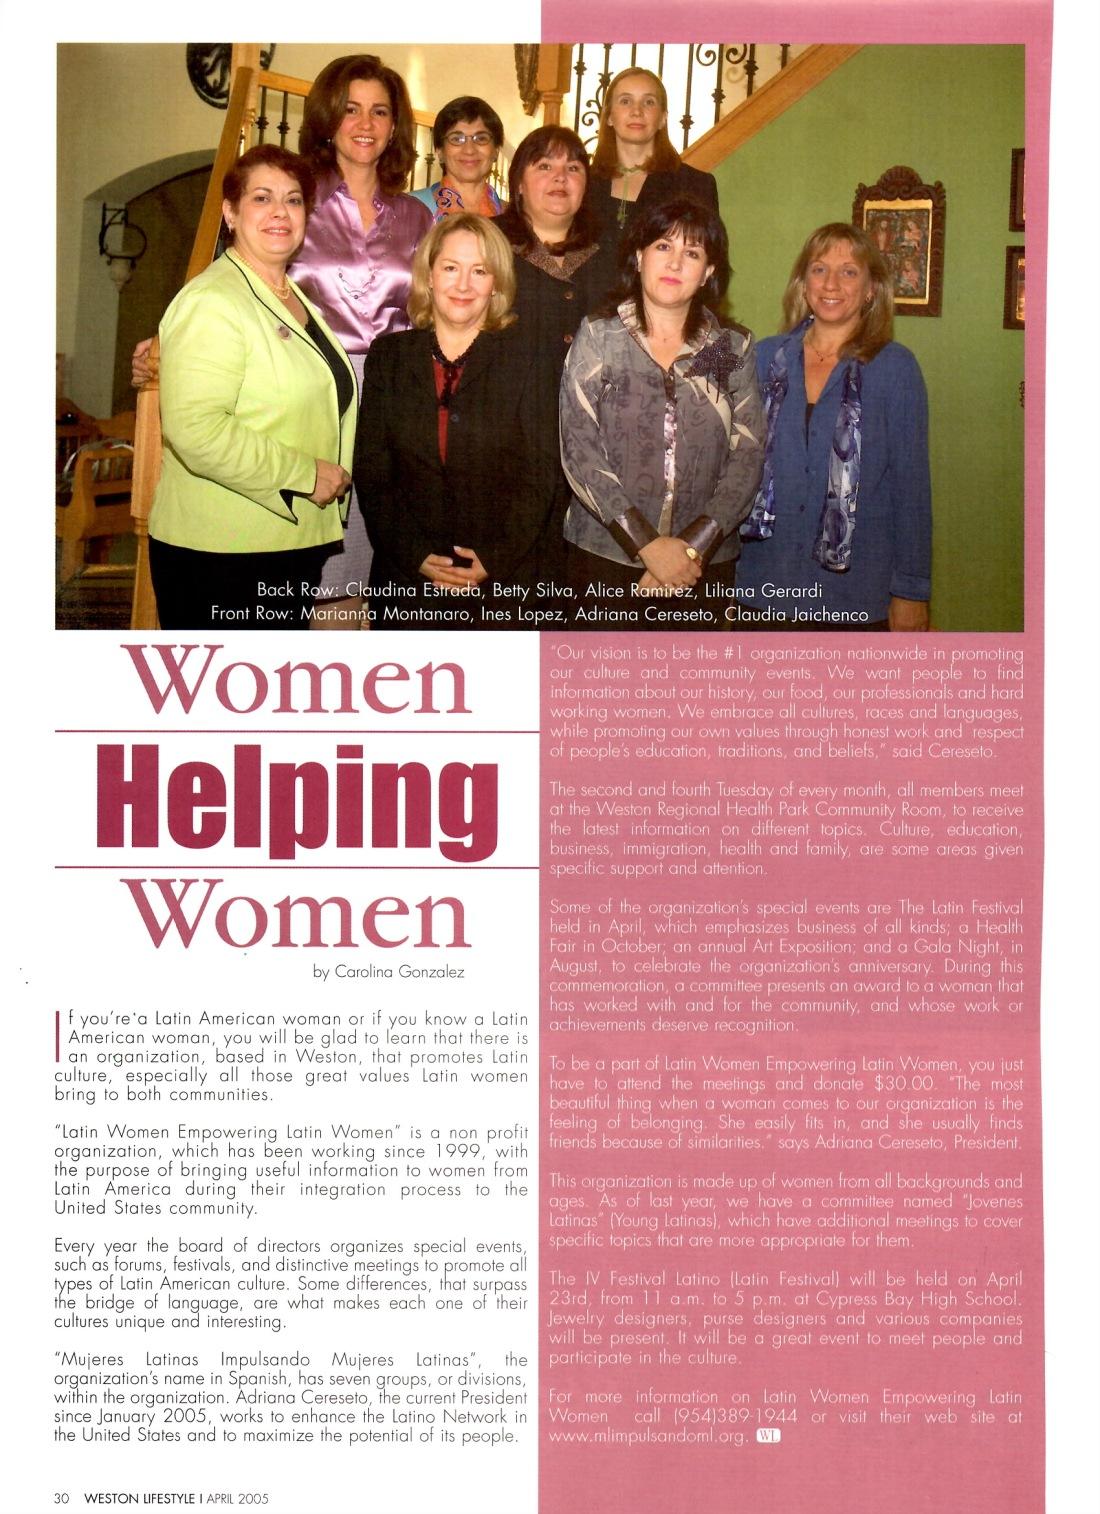 Article by Writer Carolina Gonzalez - CarolinasWords